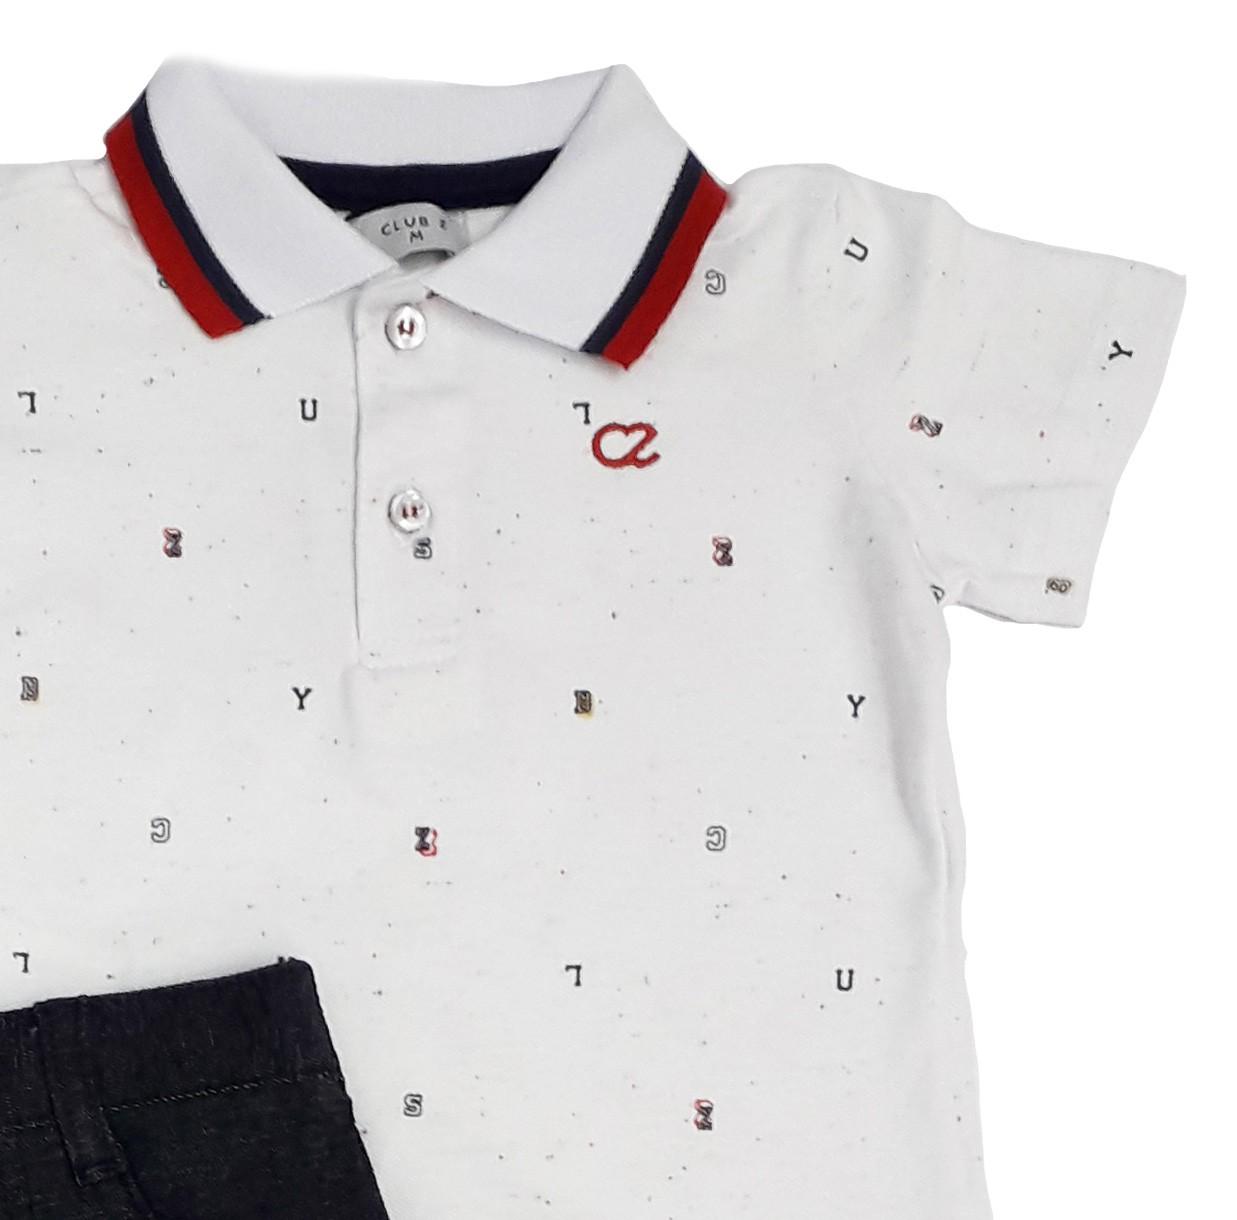 Conjunto Infantil Masculino Polo Branca e Calça Preta Club Z